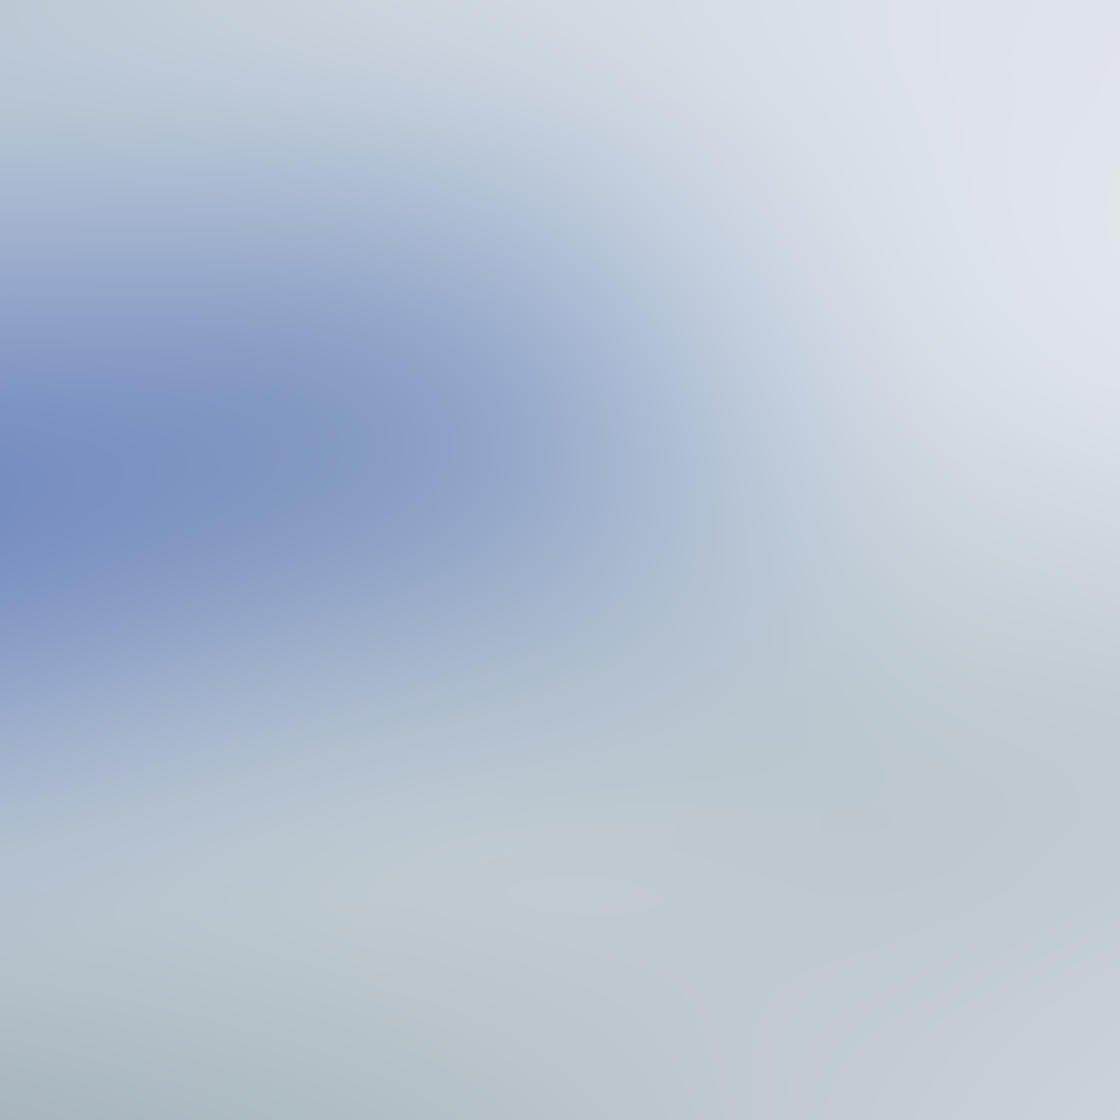 iPhone Photo Vignette 9